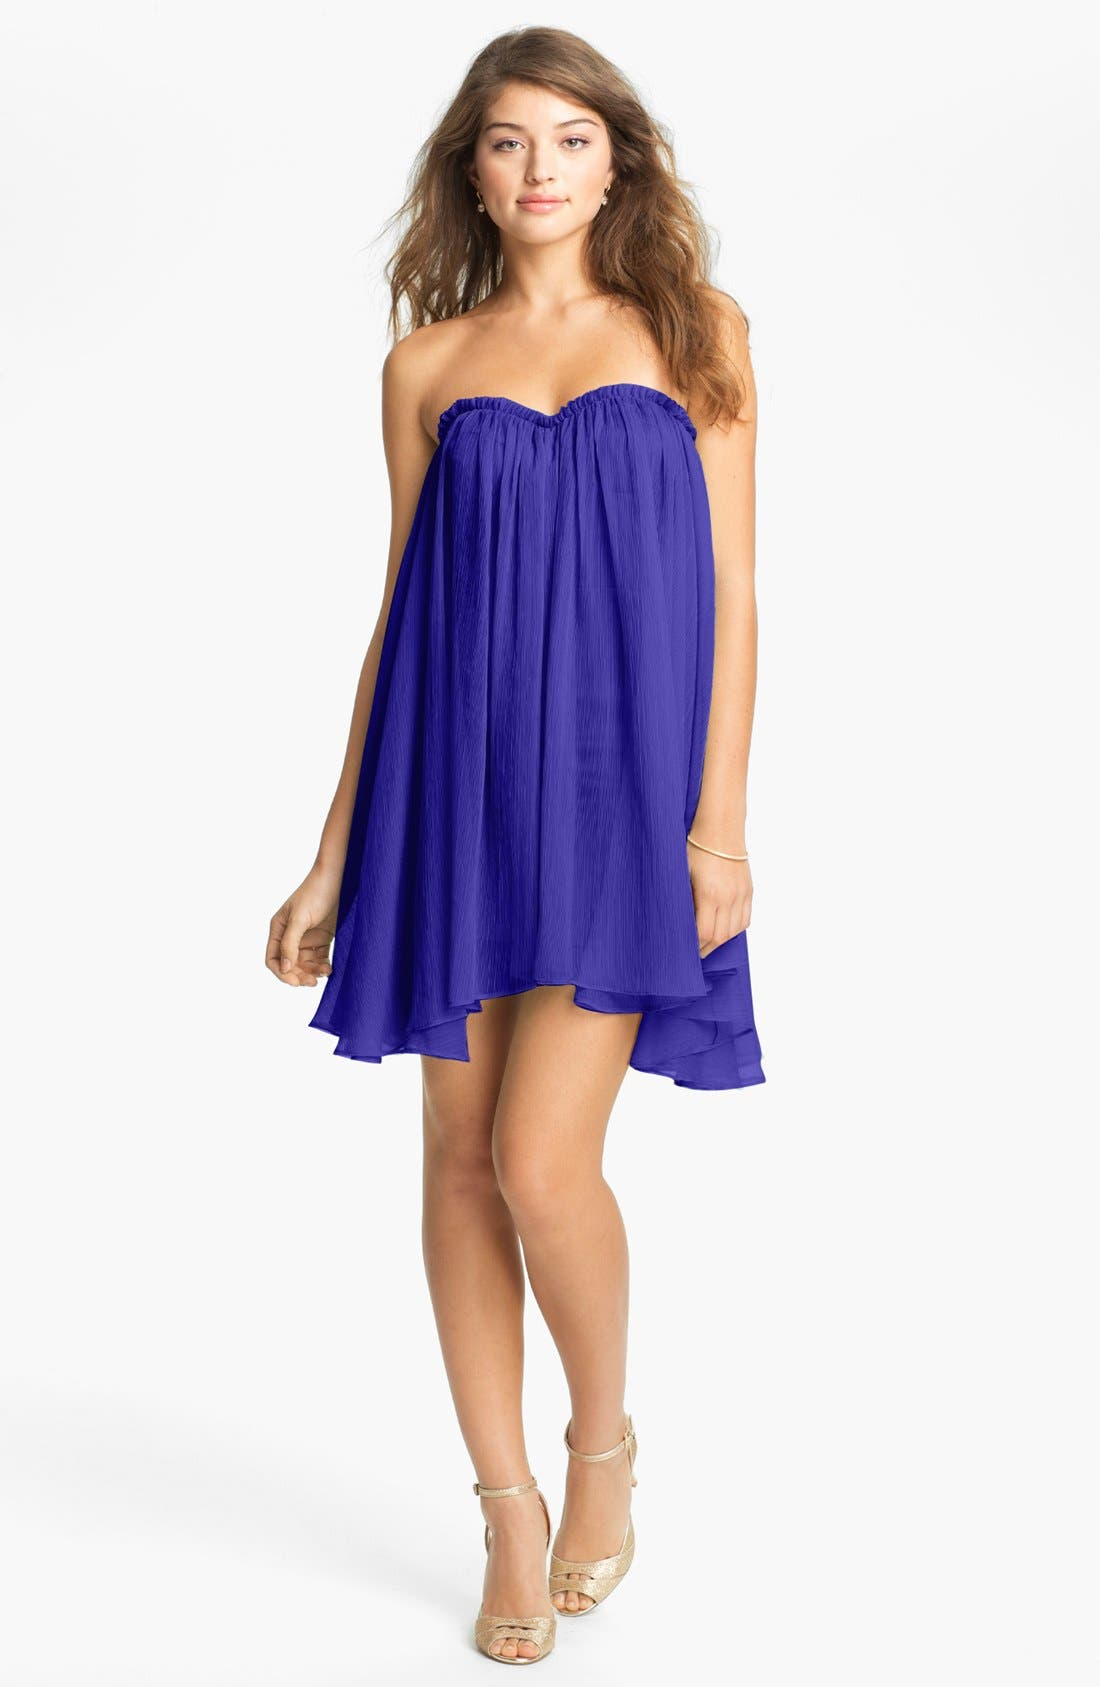 Alternate Image 1 Selected - BLAQUE LABEL Chiffon Babydoll Dress